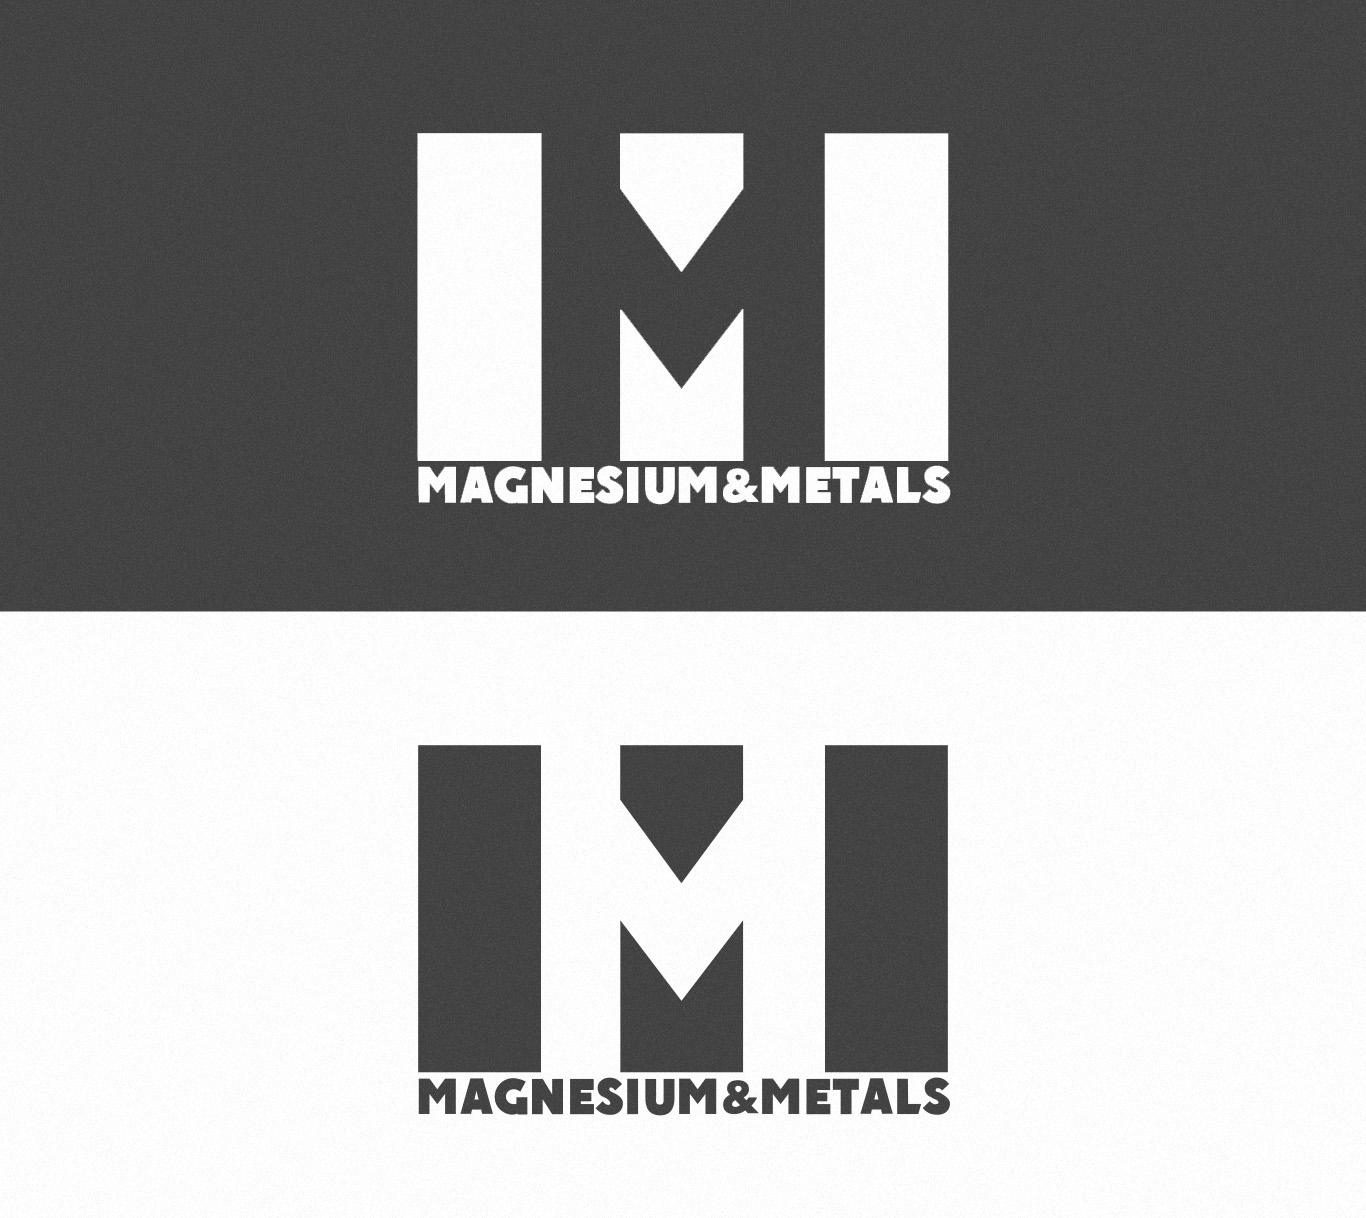 Логотип для проекта Magnesium&Metals фото f_4e7a2498bd137.jpg